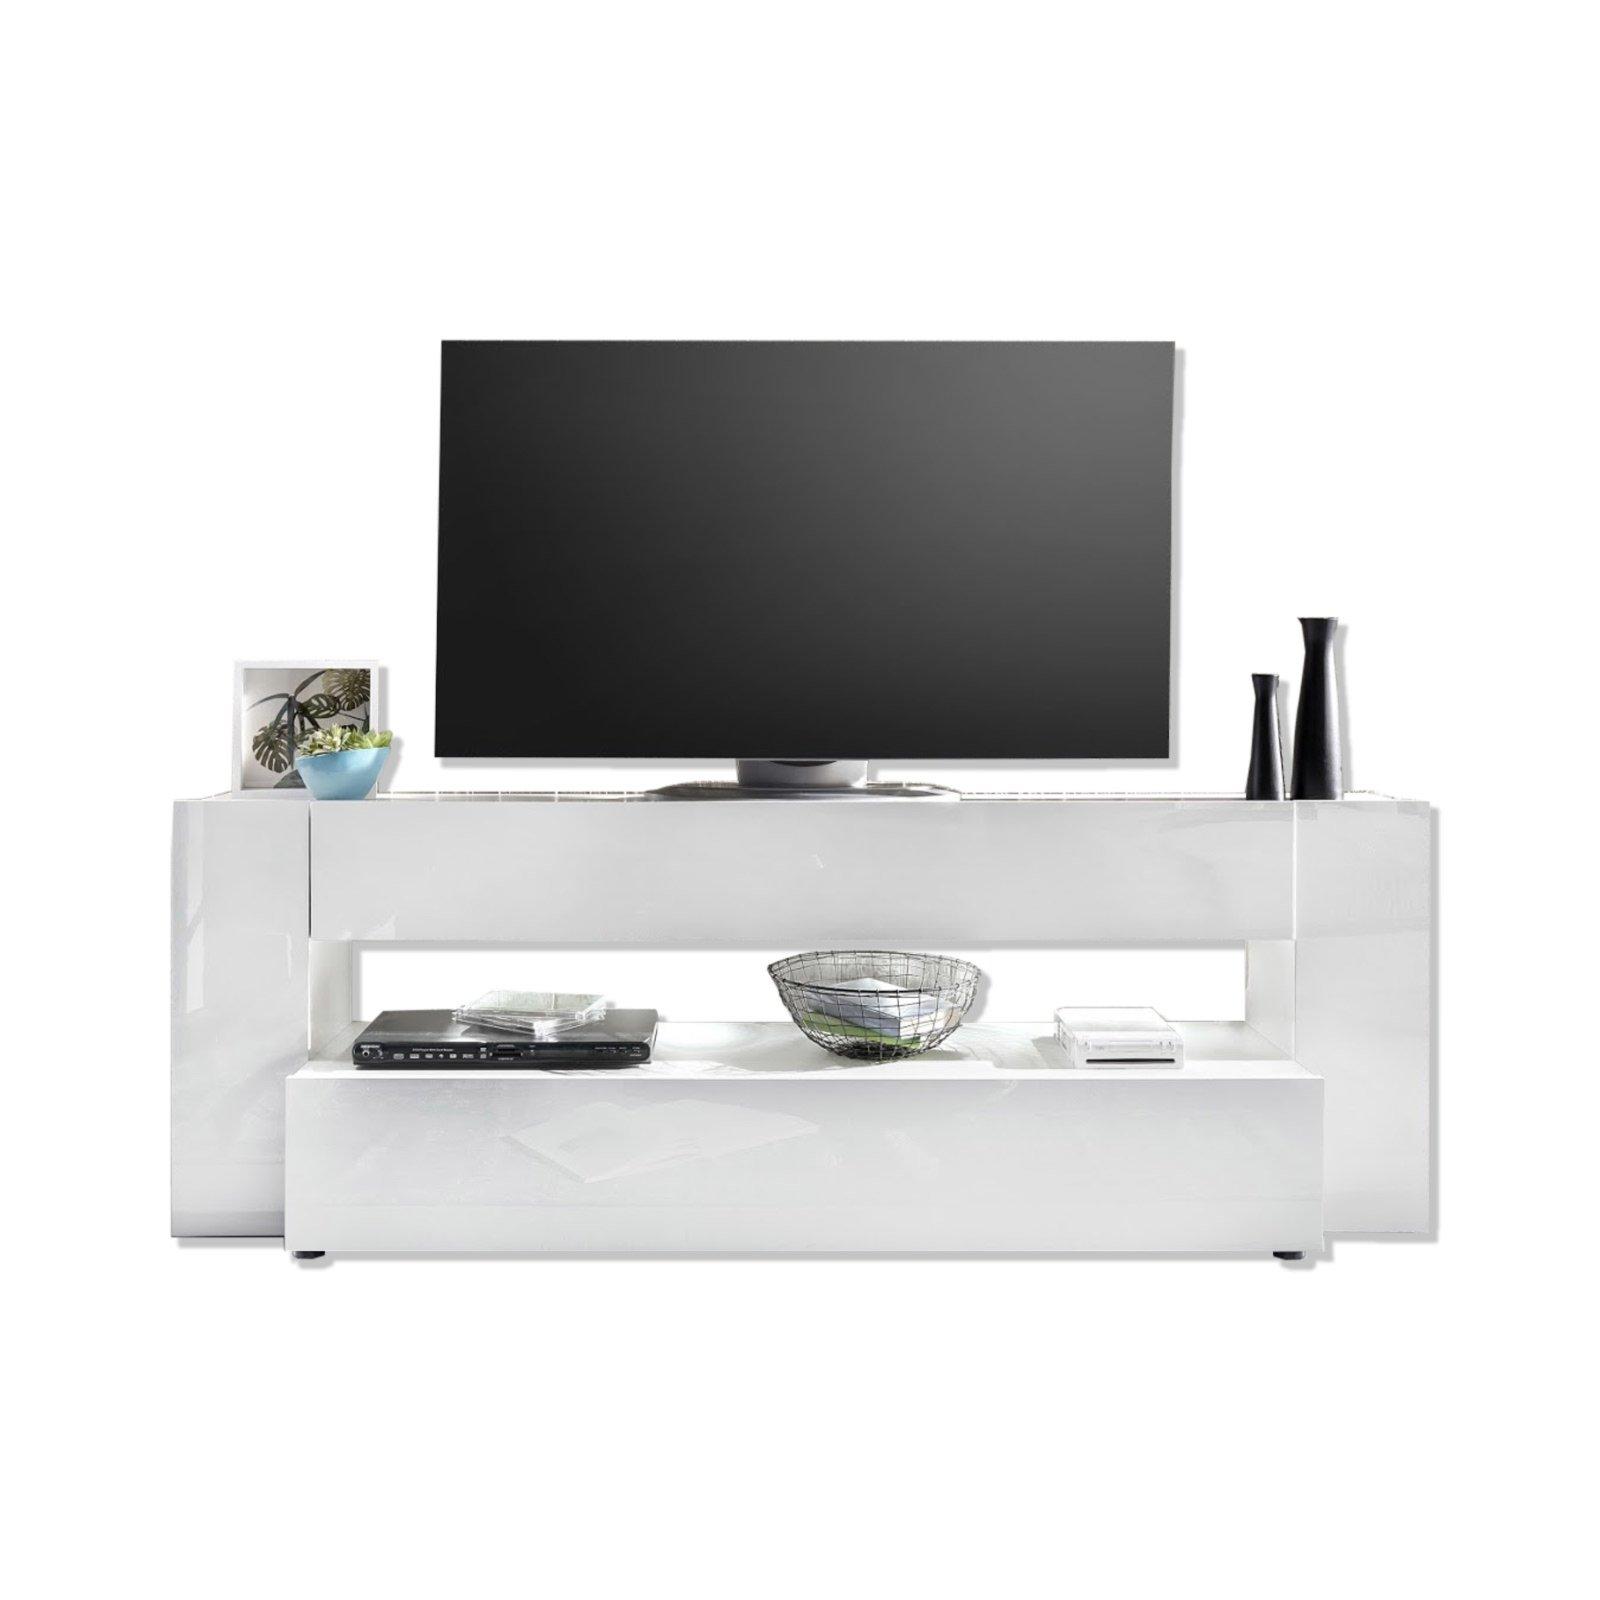 lowboard onyx wei hochglanz 185 cm breit tv lowboards b nke tv hifi m bel m bel. Black Bedroom Furniture Sets. Home Design Ideas